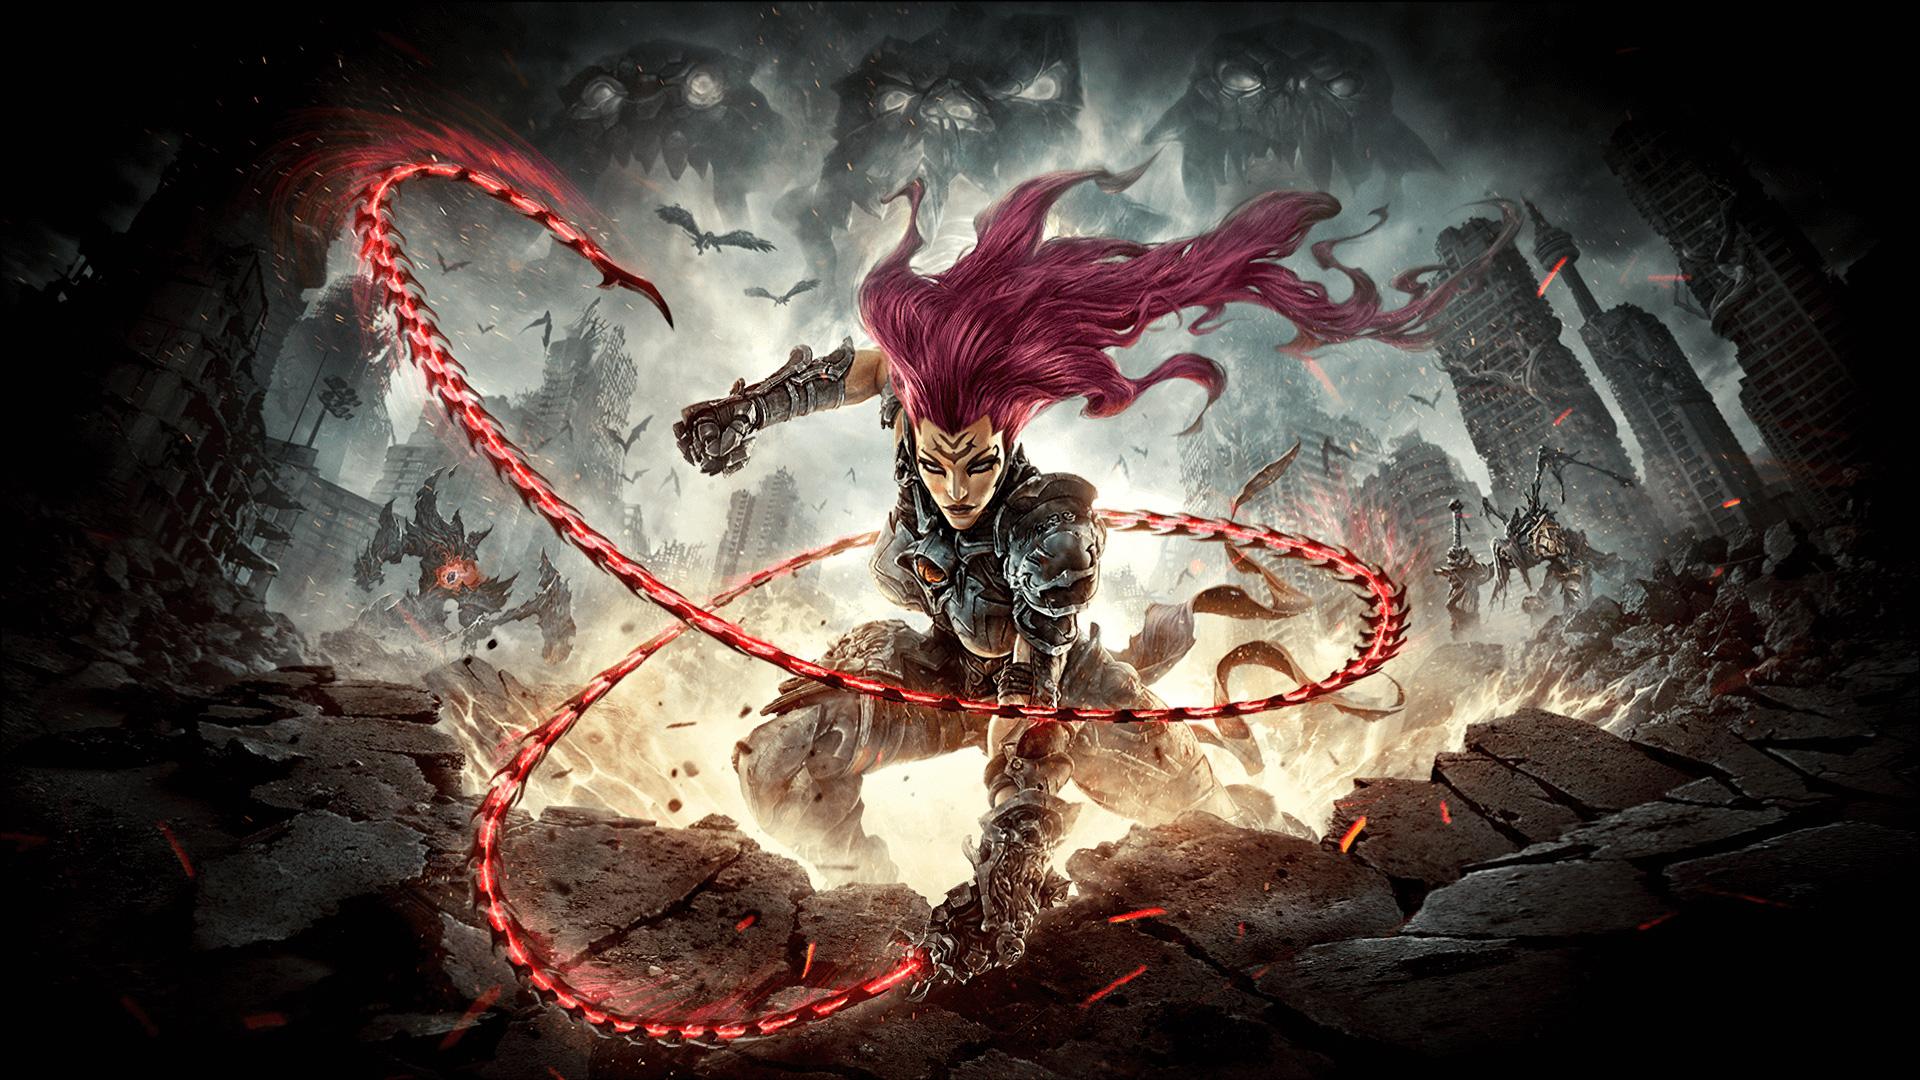 Darksiders Iii Fury Hd Games 4k Wallpapers Images Backgrounds